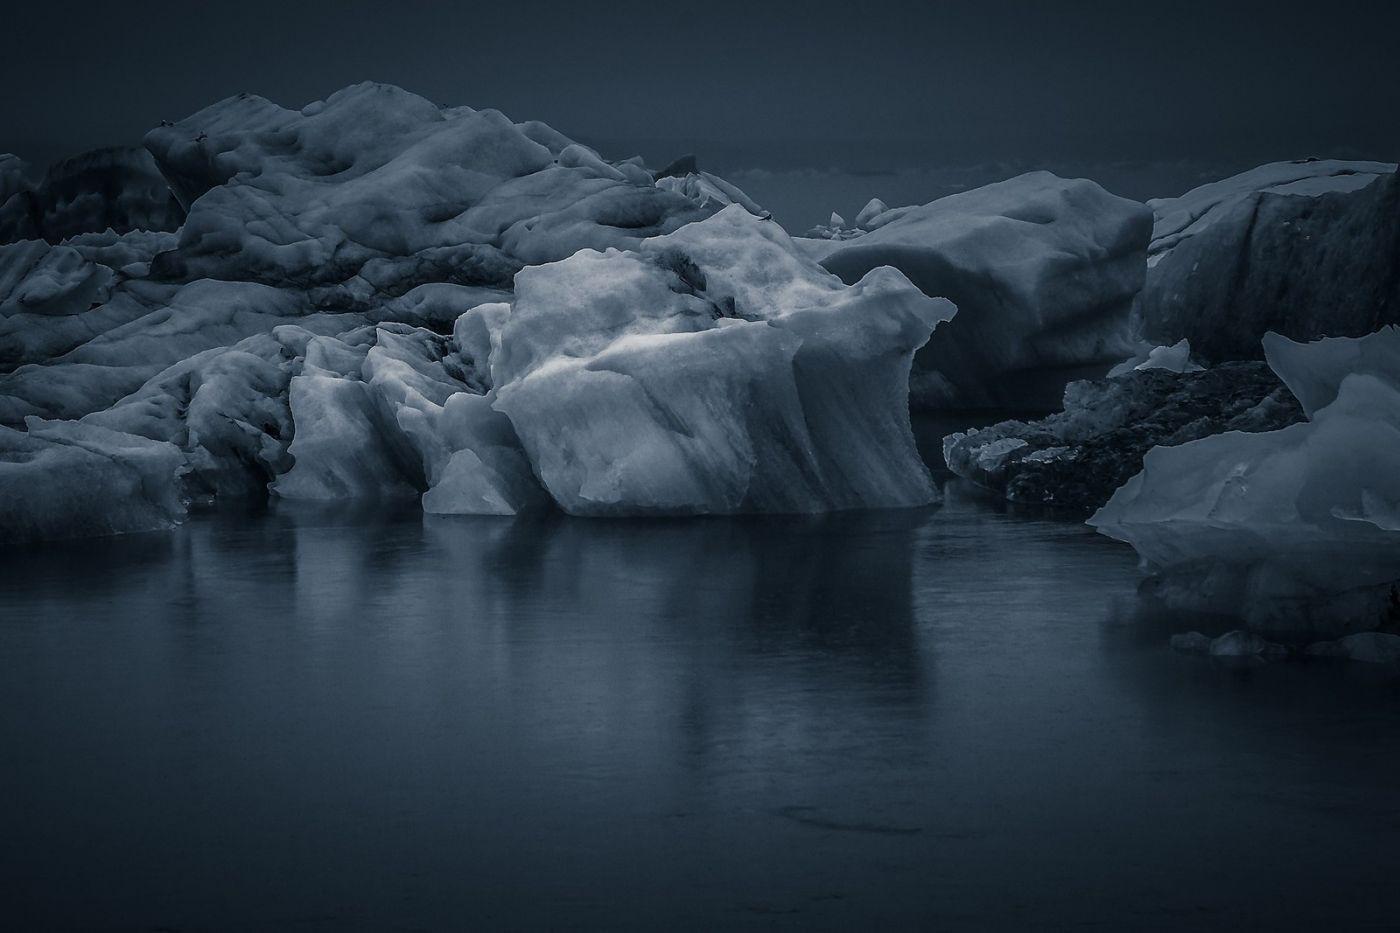 冰岛冰川泻湖(Glacier Lagoon),流动的冰川_图1-14